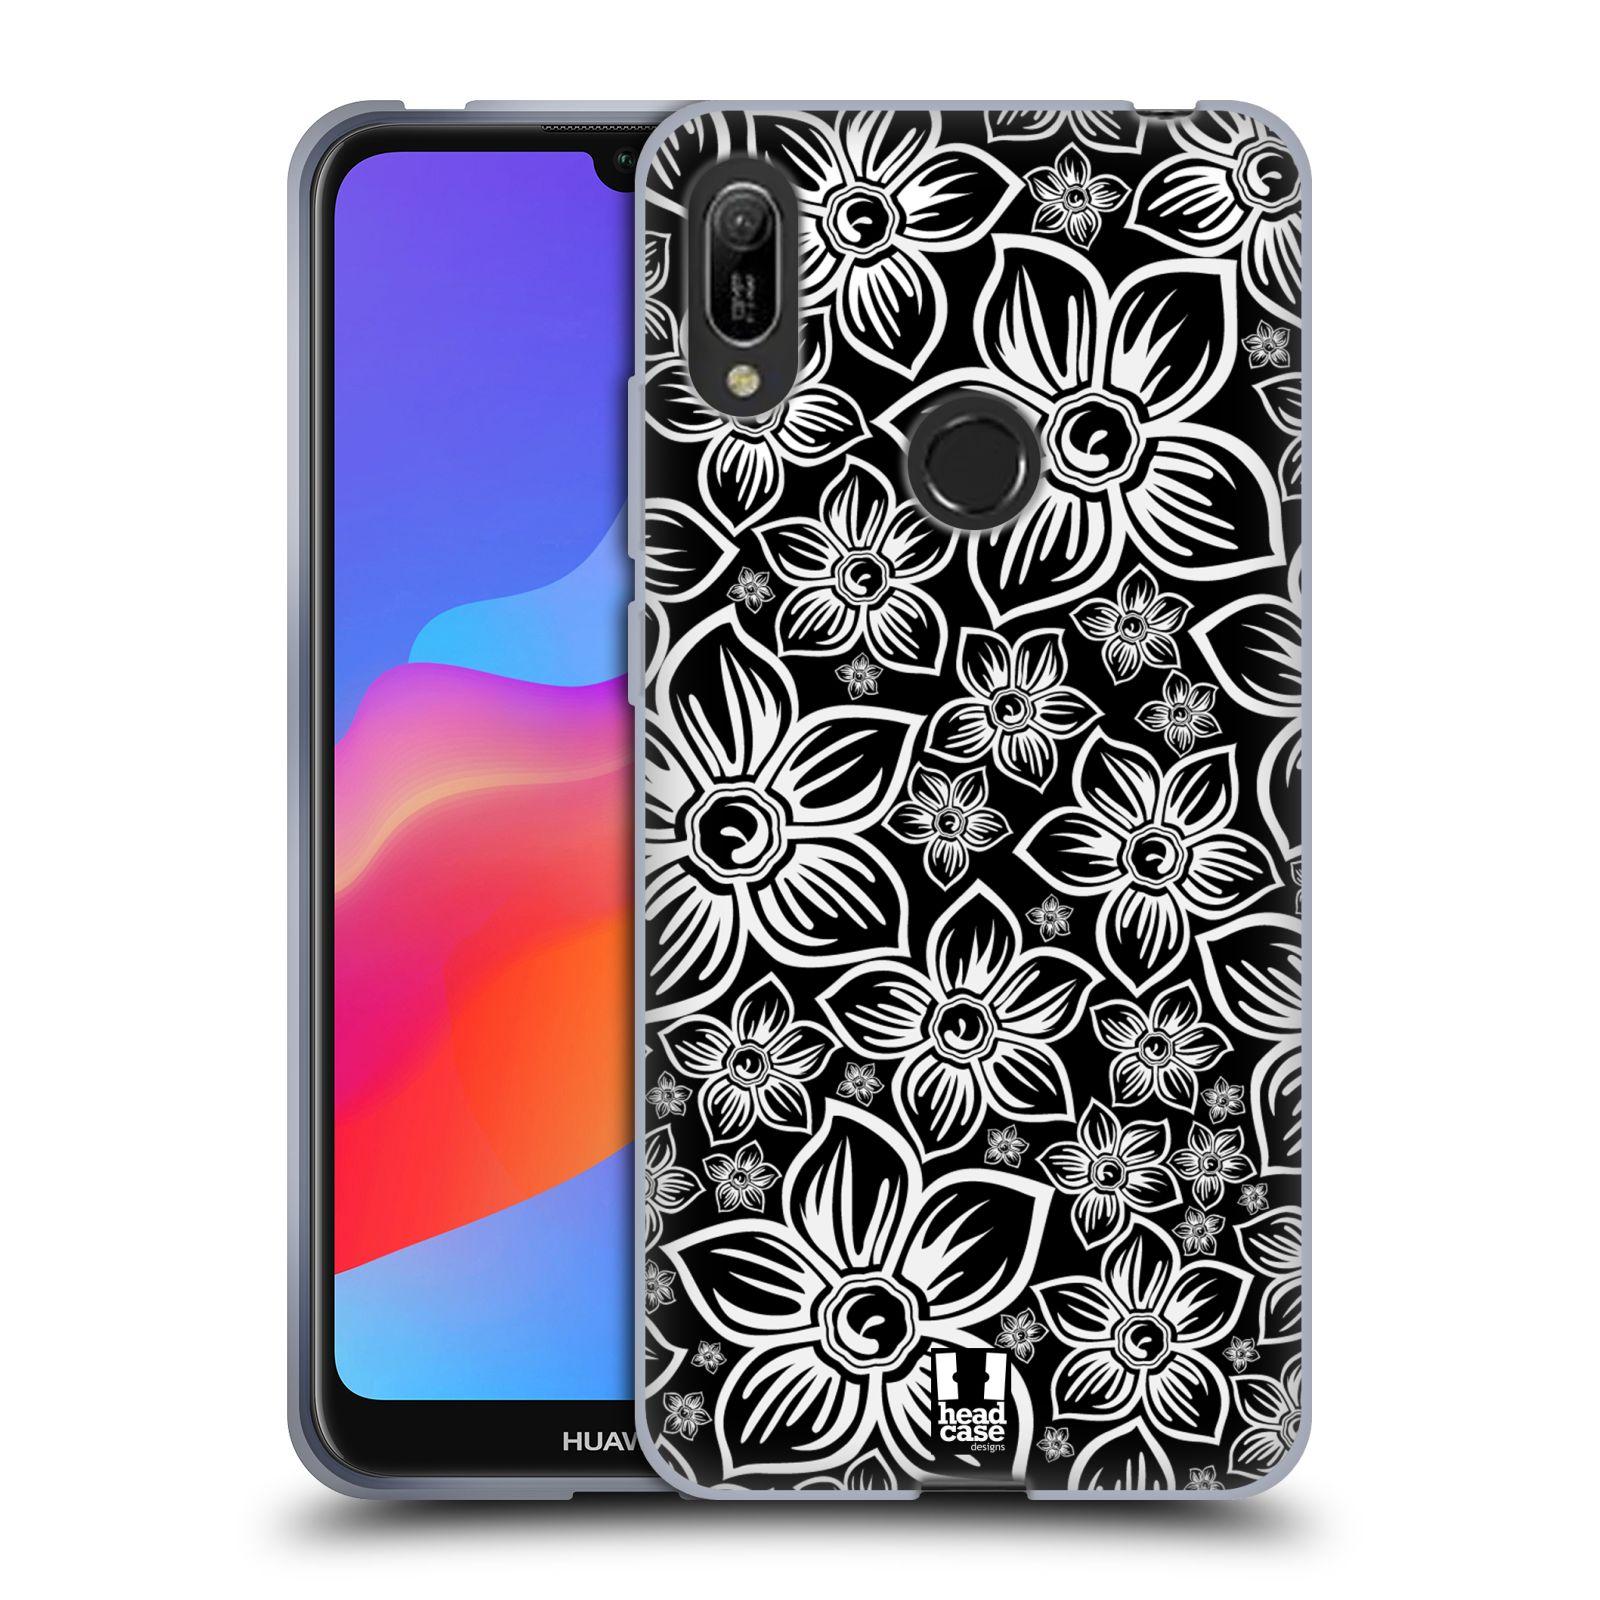 Silikonové pouzdro na mobil Huawei Y6 (2019) - Head Case - FLORAL DAISY